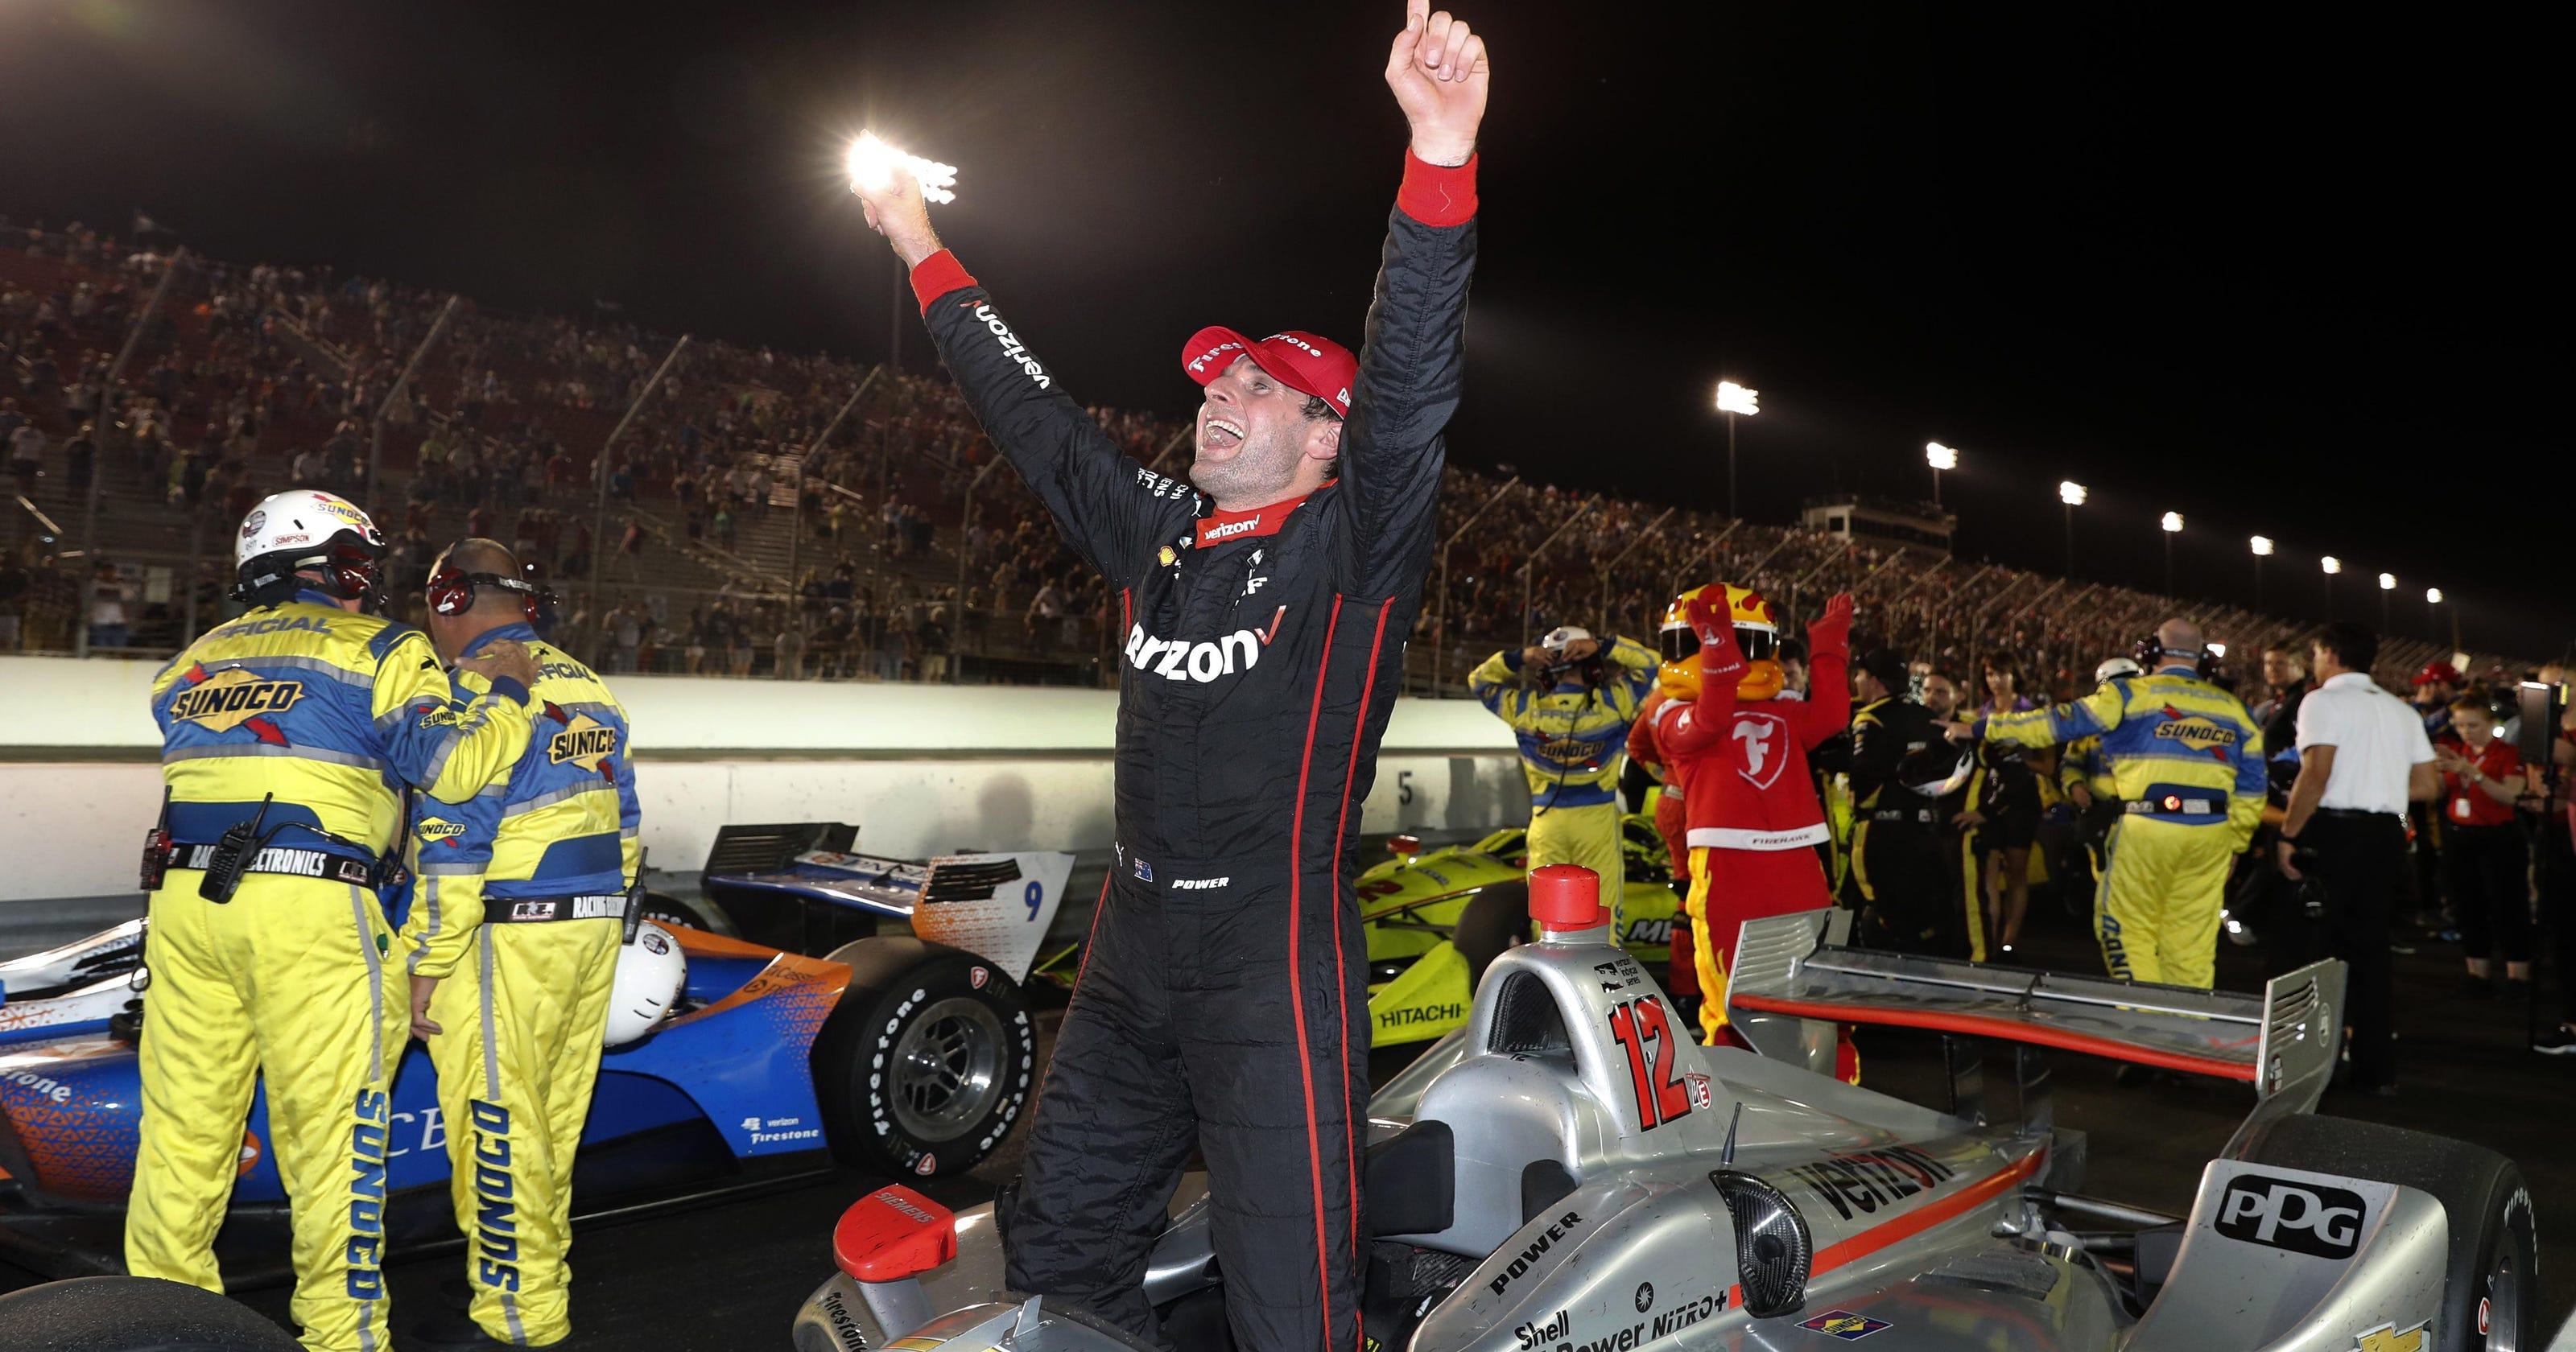 Saay S Motors Splash Of Gas Fuels To Indycar Win At Gateway